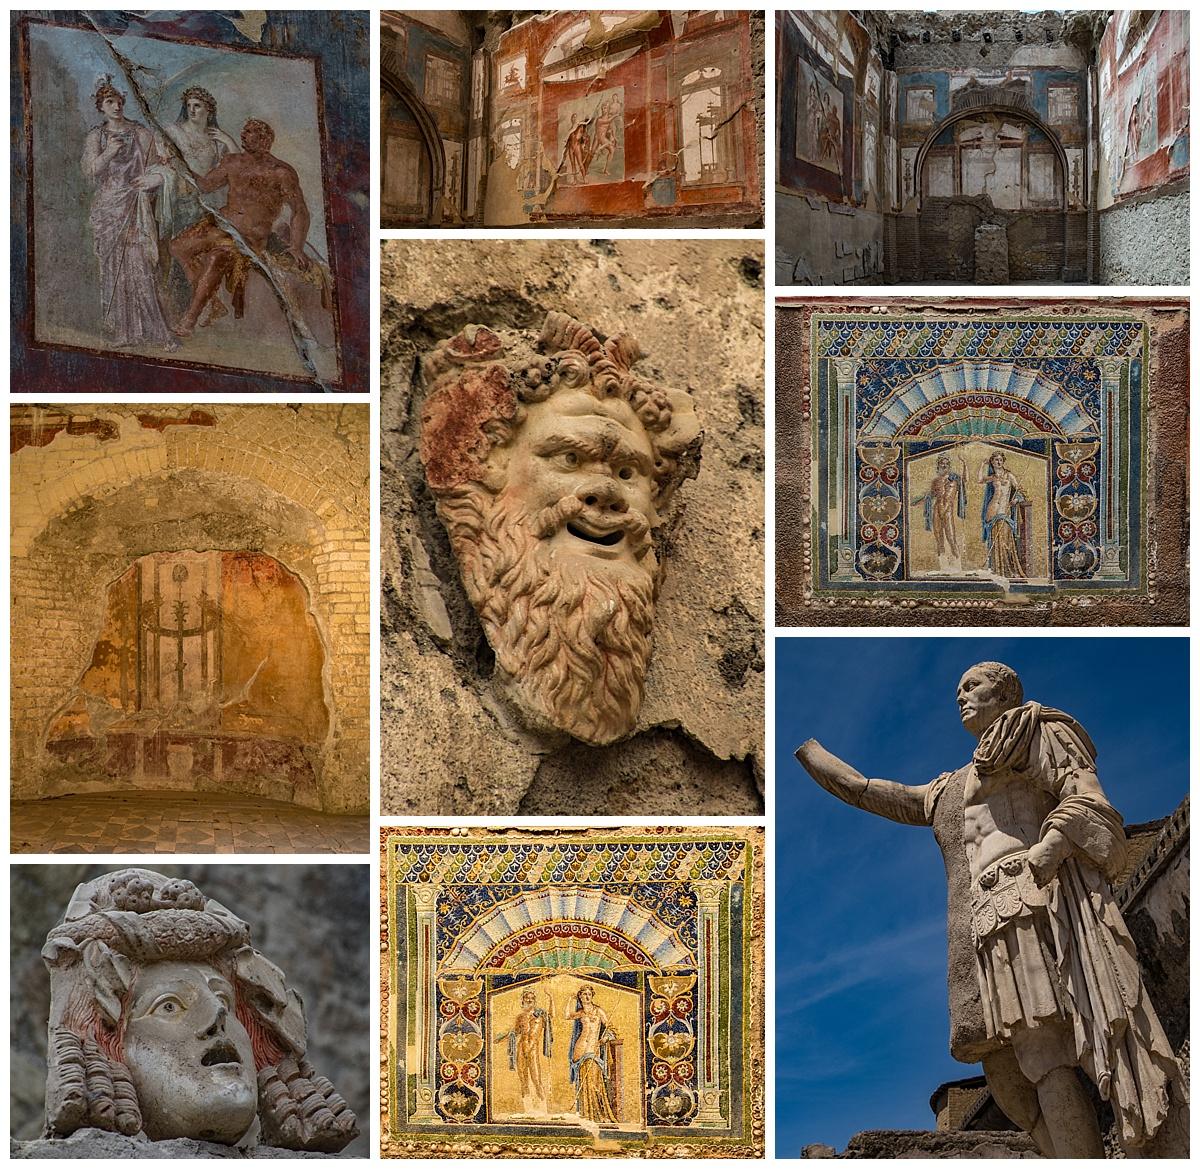 Herculaneum, Italy - frescoe